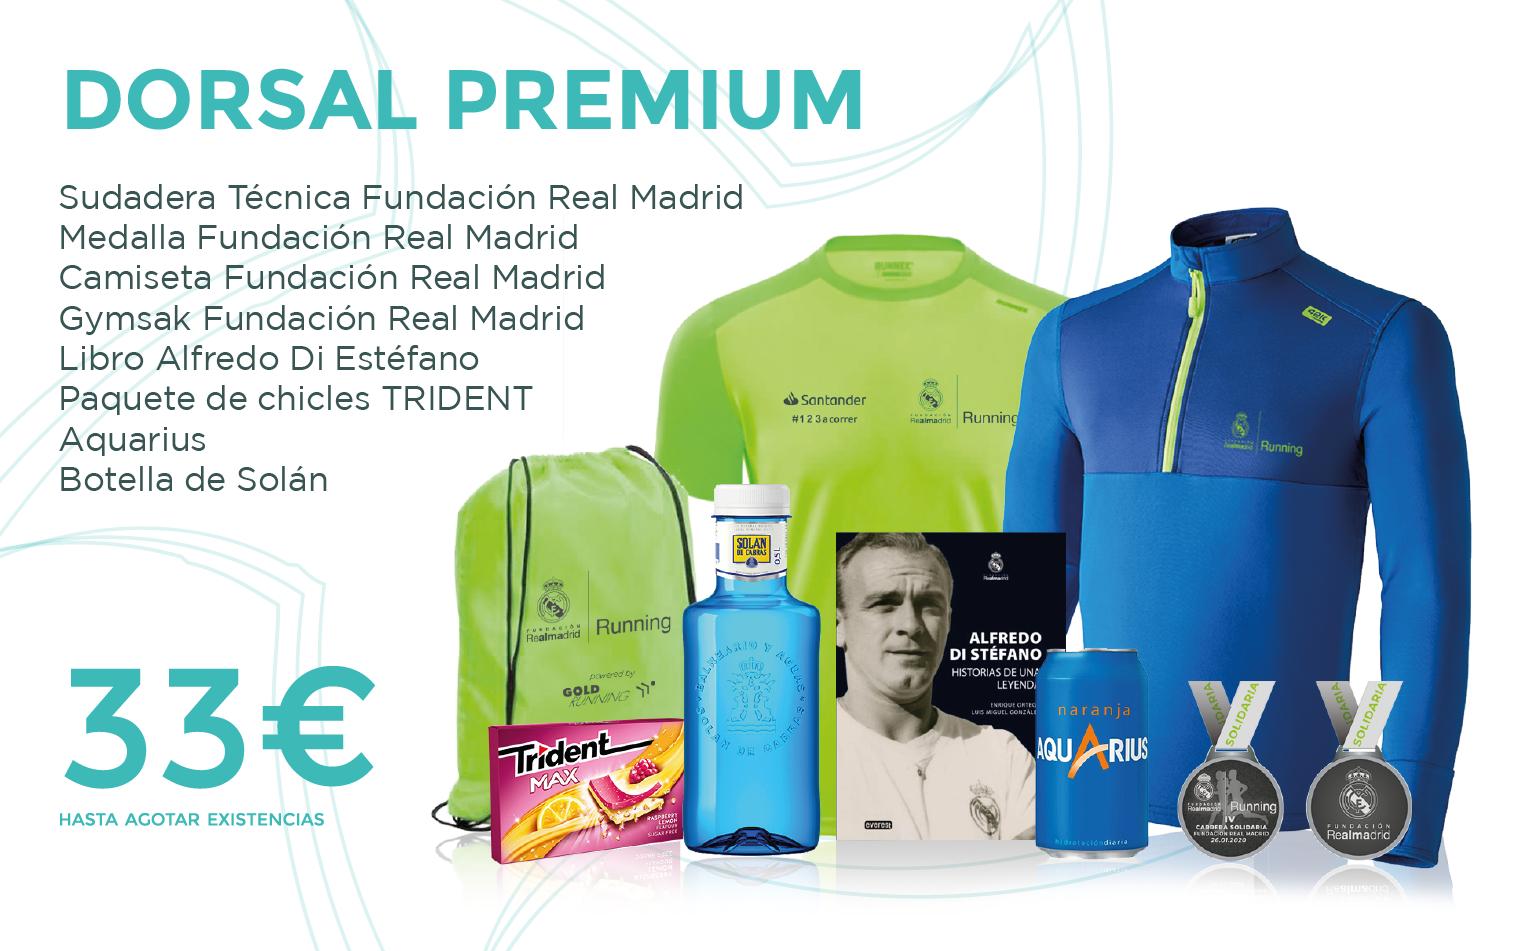 RUNNING-frm-MADRID-PREMIUM-dorsal-20192